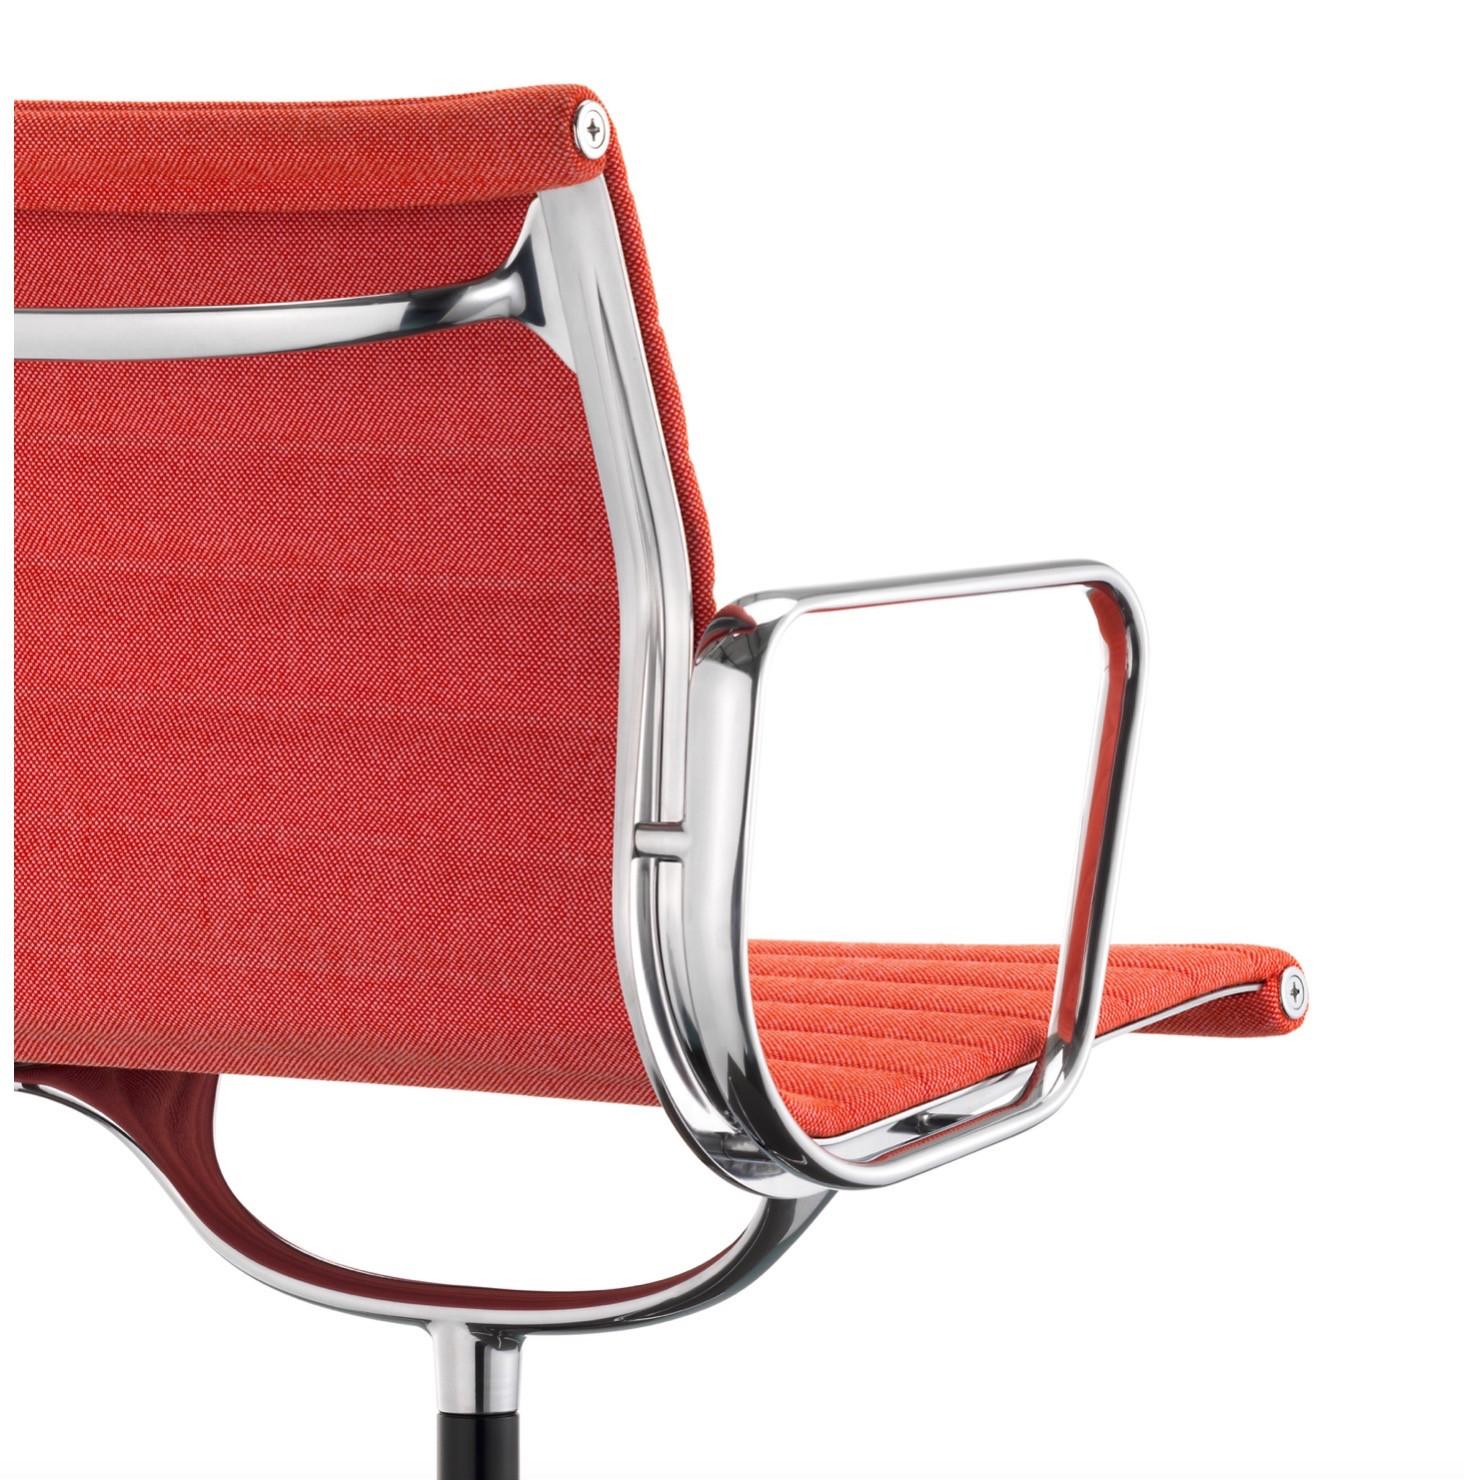 vitra aluminium chair ea 117. Black Bedroom Furniture Sets. Home Design Ideas